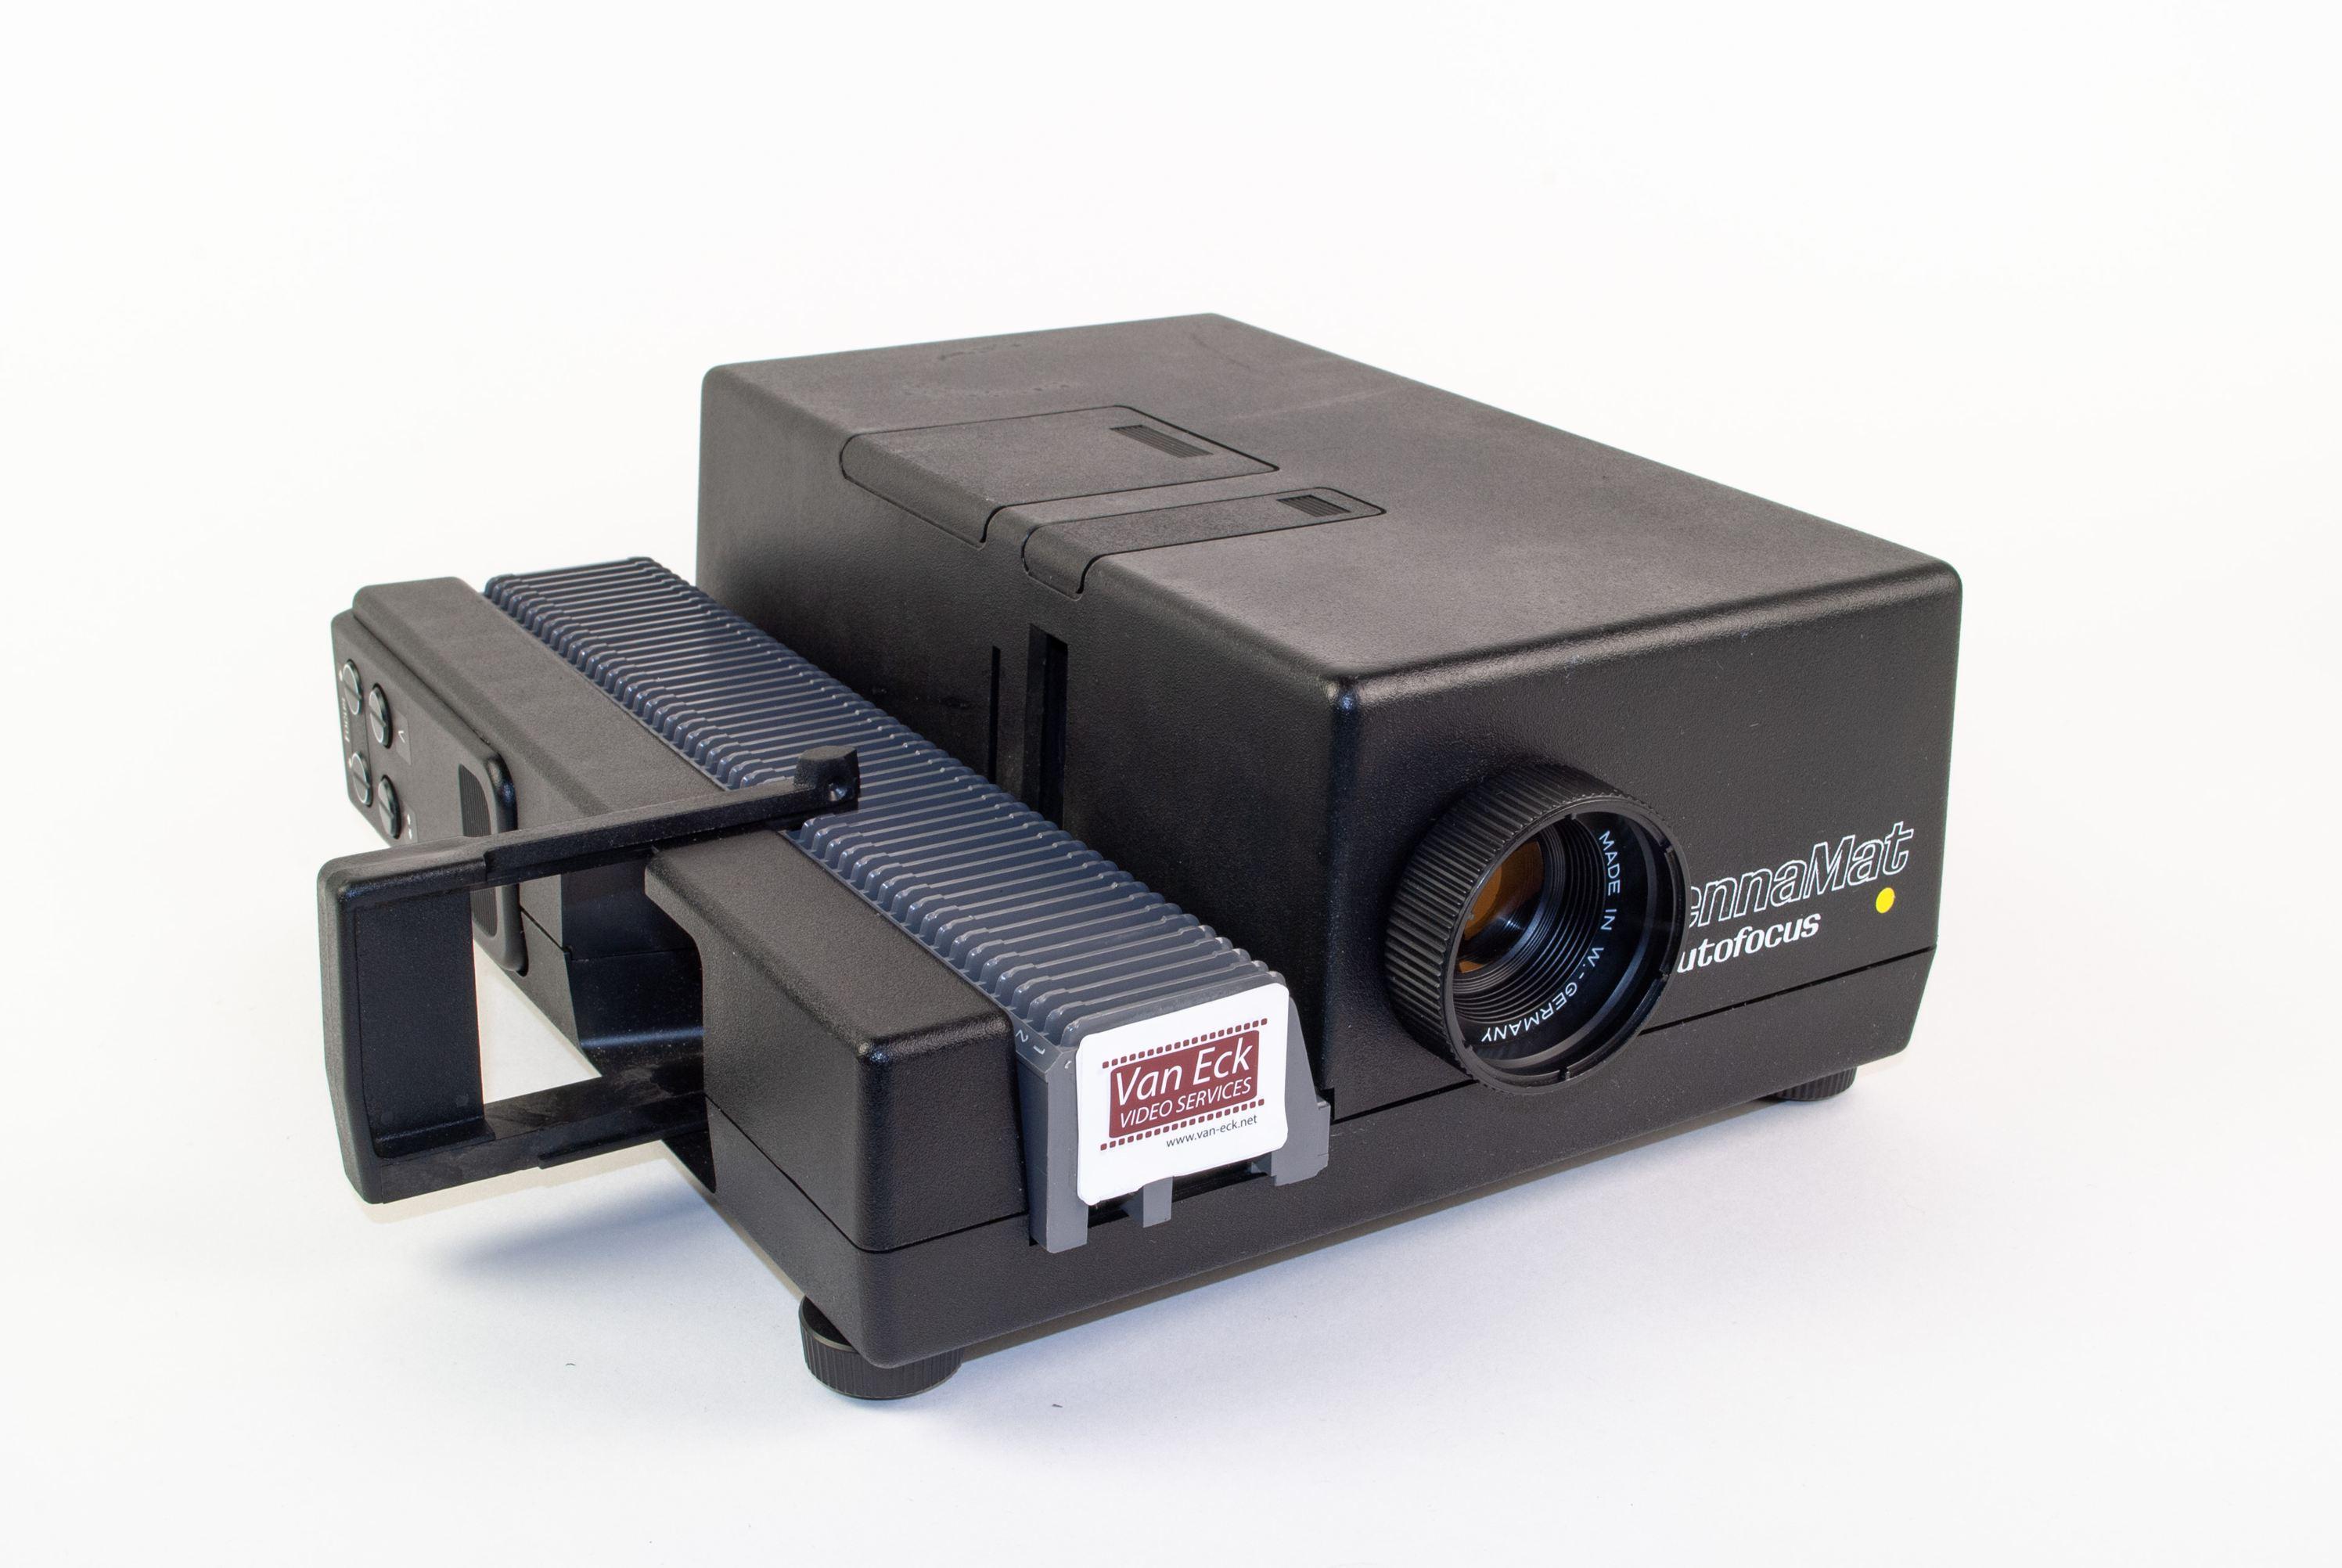 Ennamat Autofocus (model 8020)